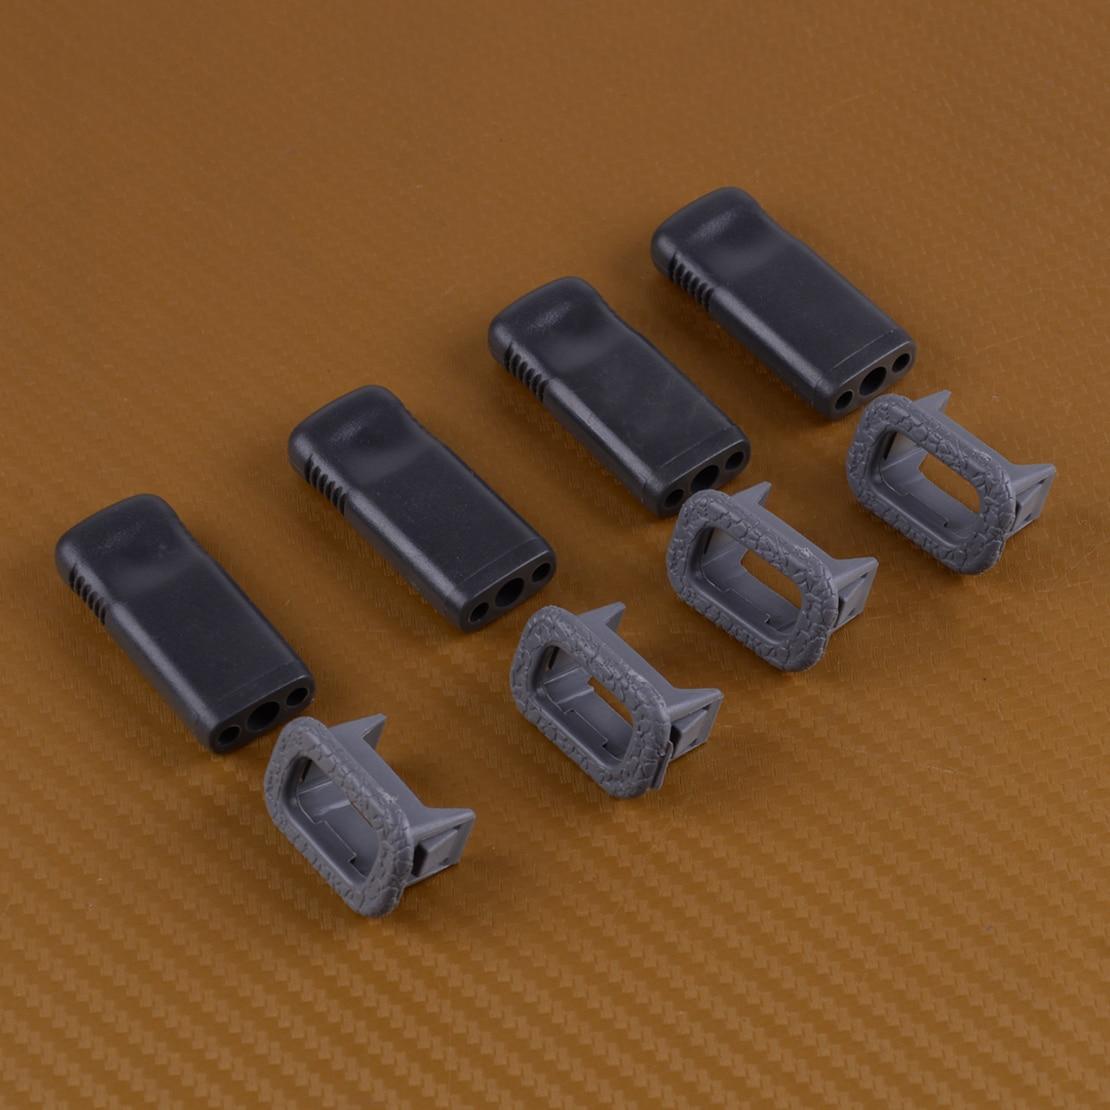 beler 4PCS Door Lock Pin Cap Set Fit for Mitsubishi Pajero Montero Shogun MK2 1991-1999 MB774548//MB775216